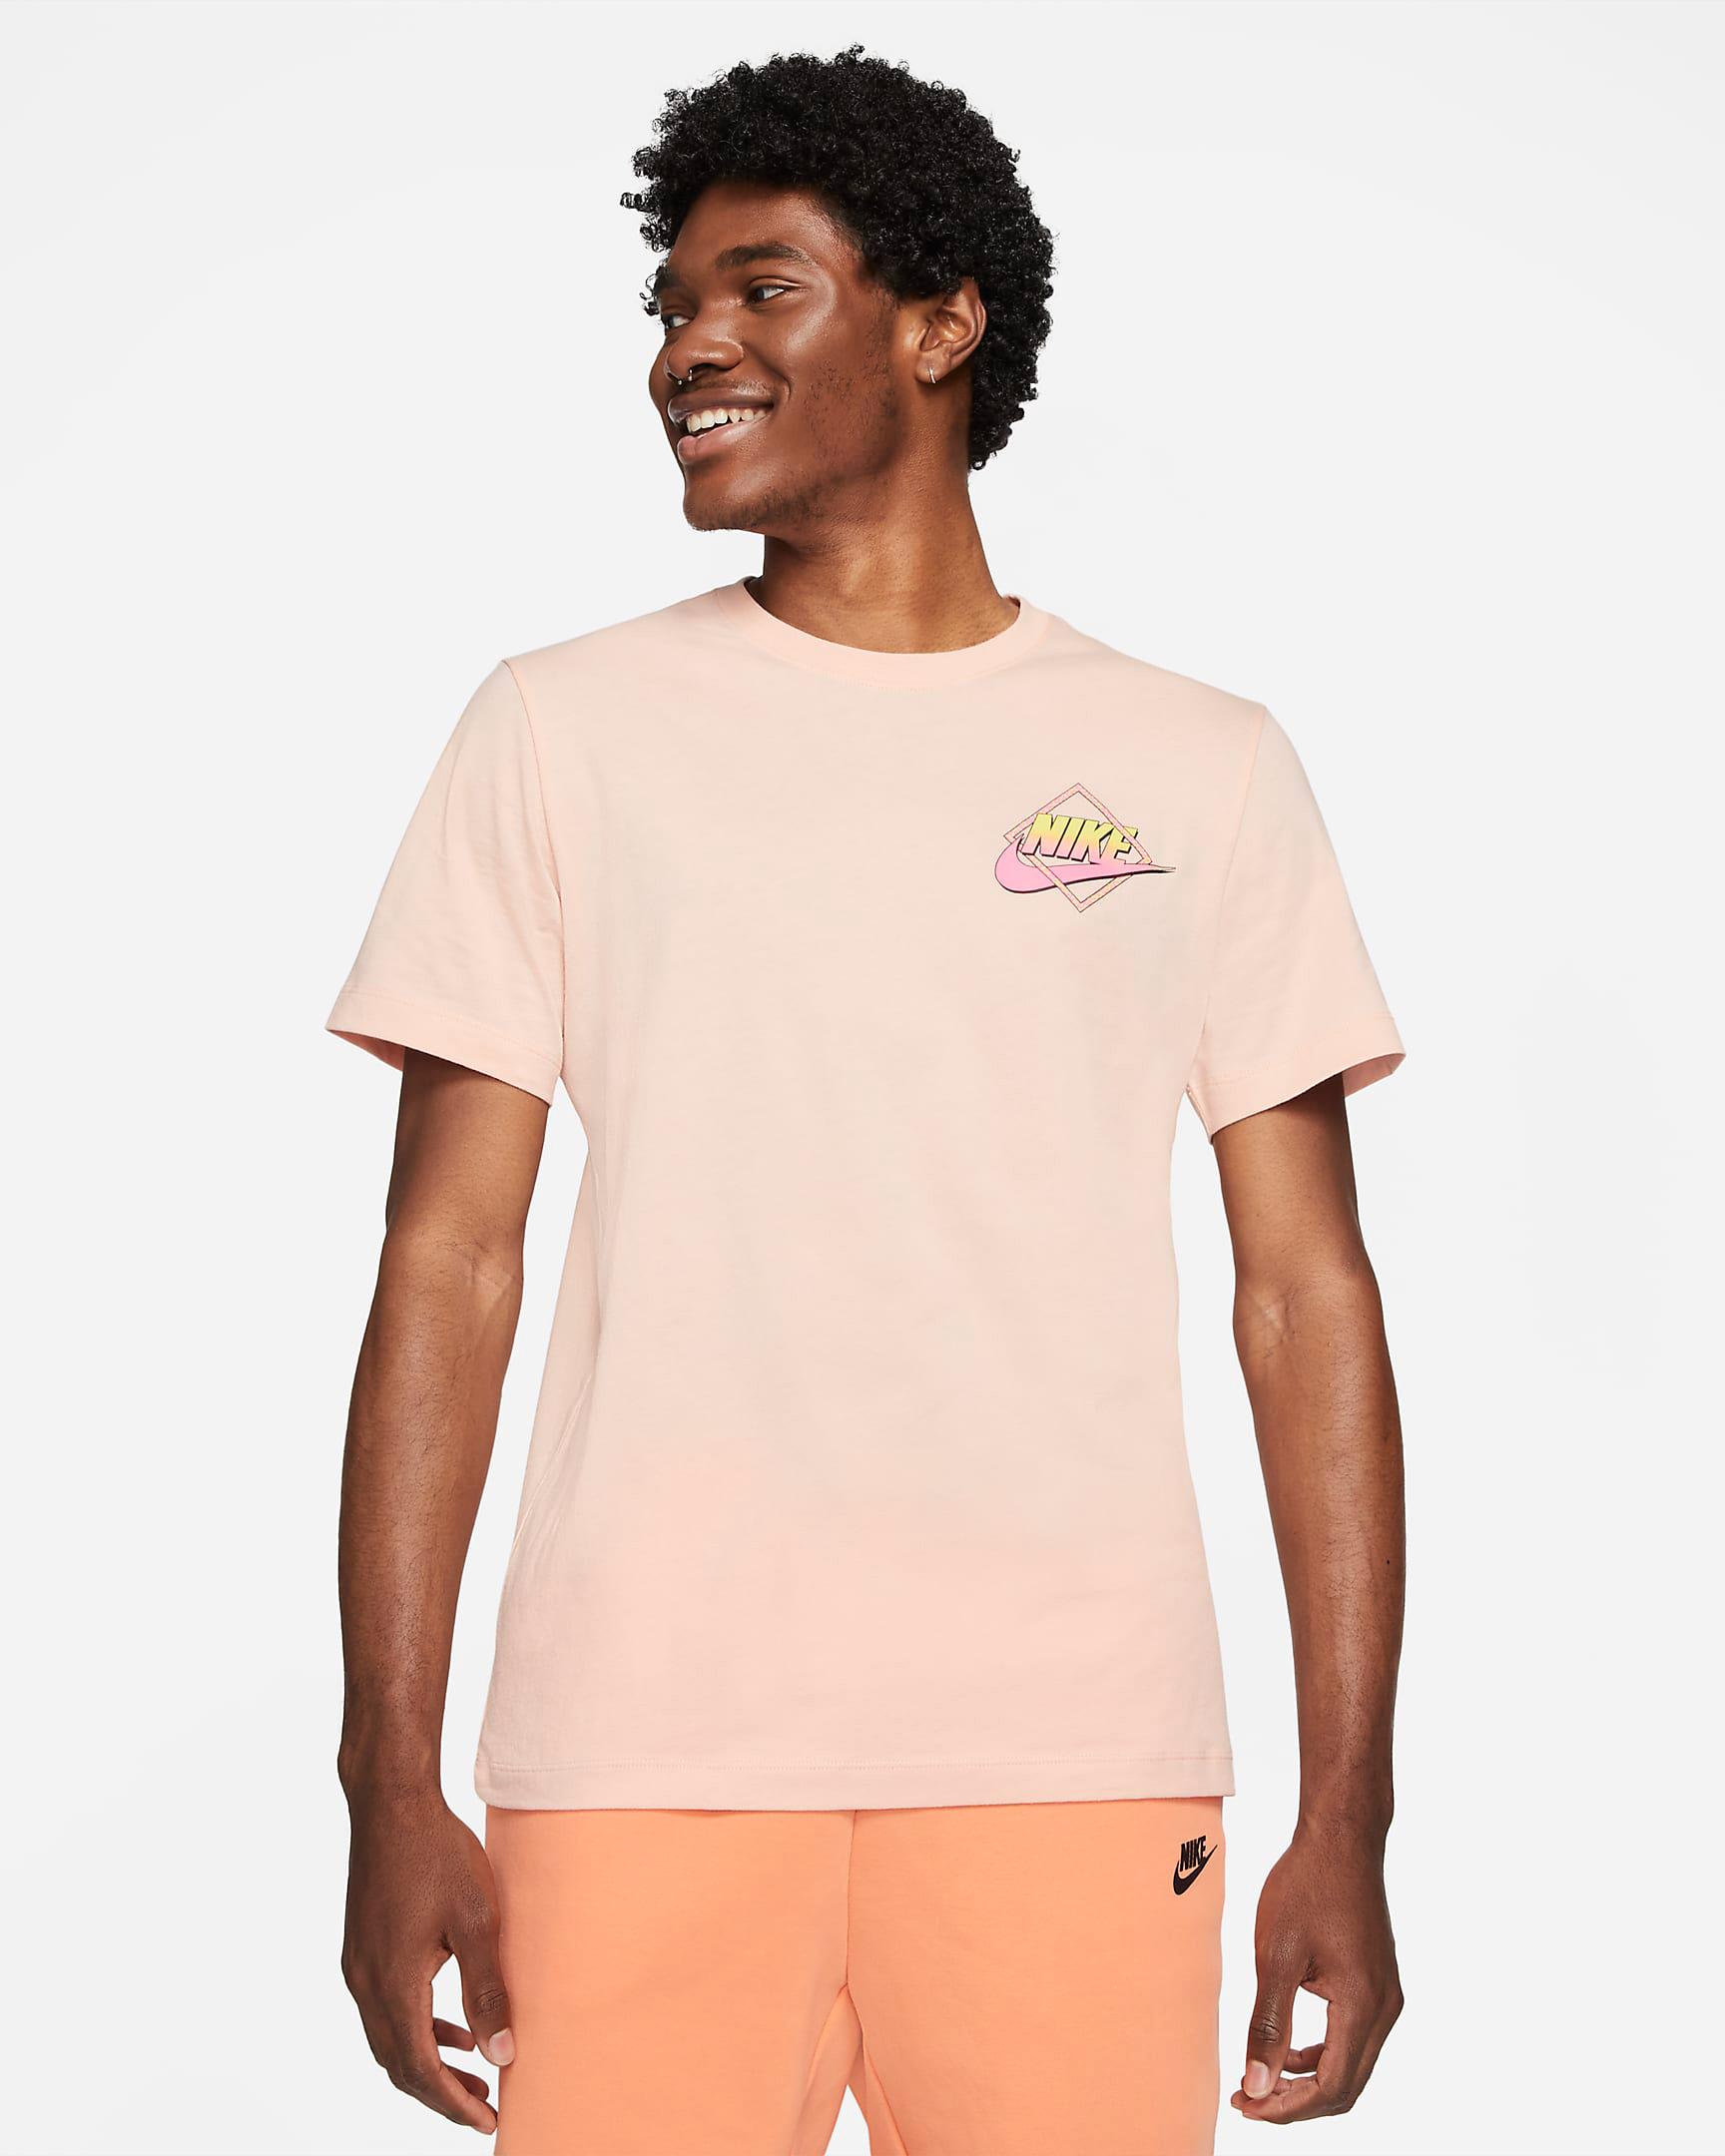 nike-arctic-orange-beach-bum-graphic-t-shirt-1